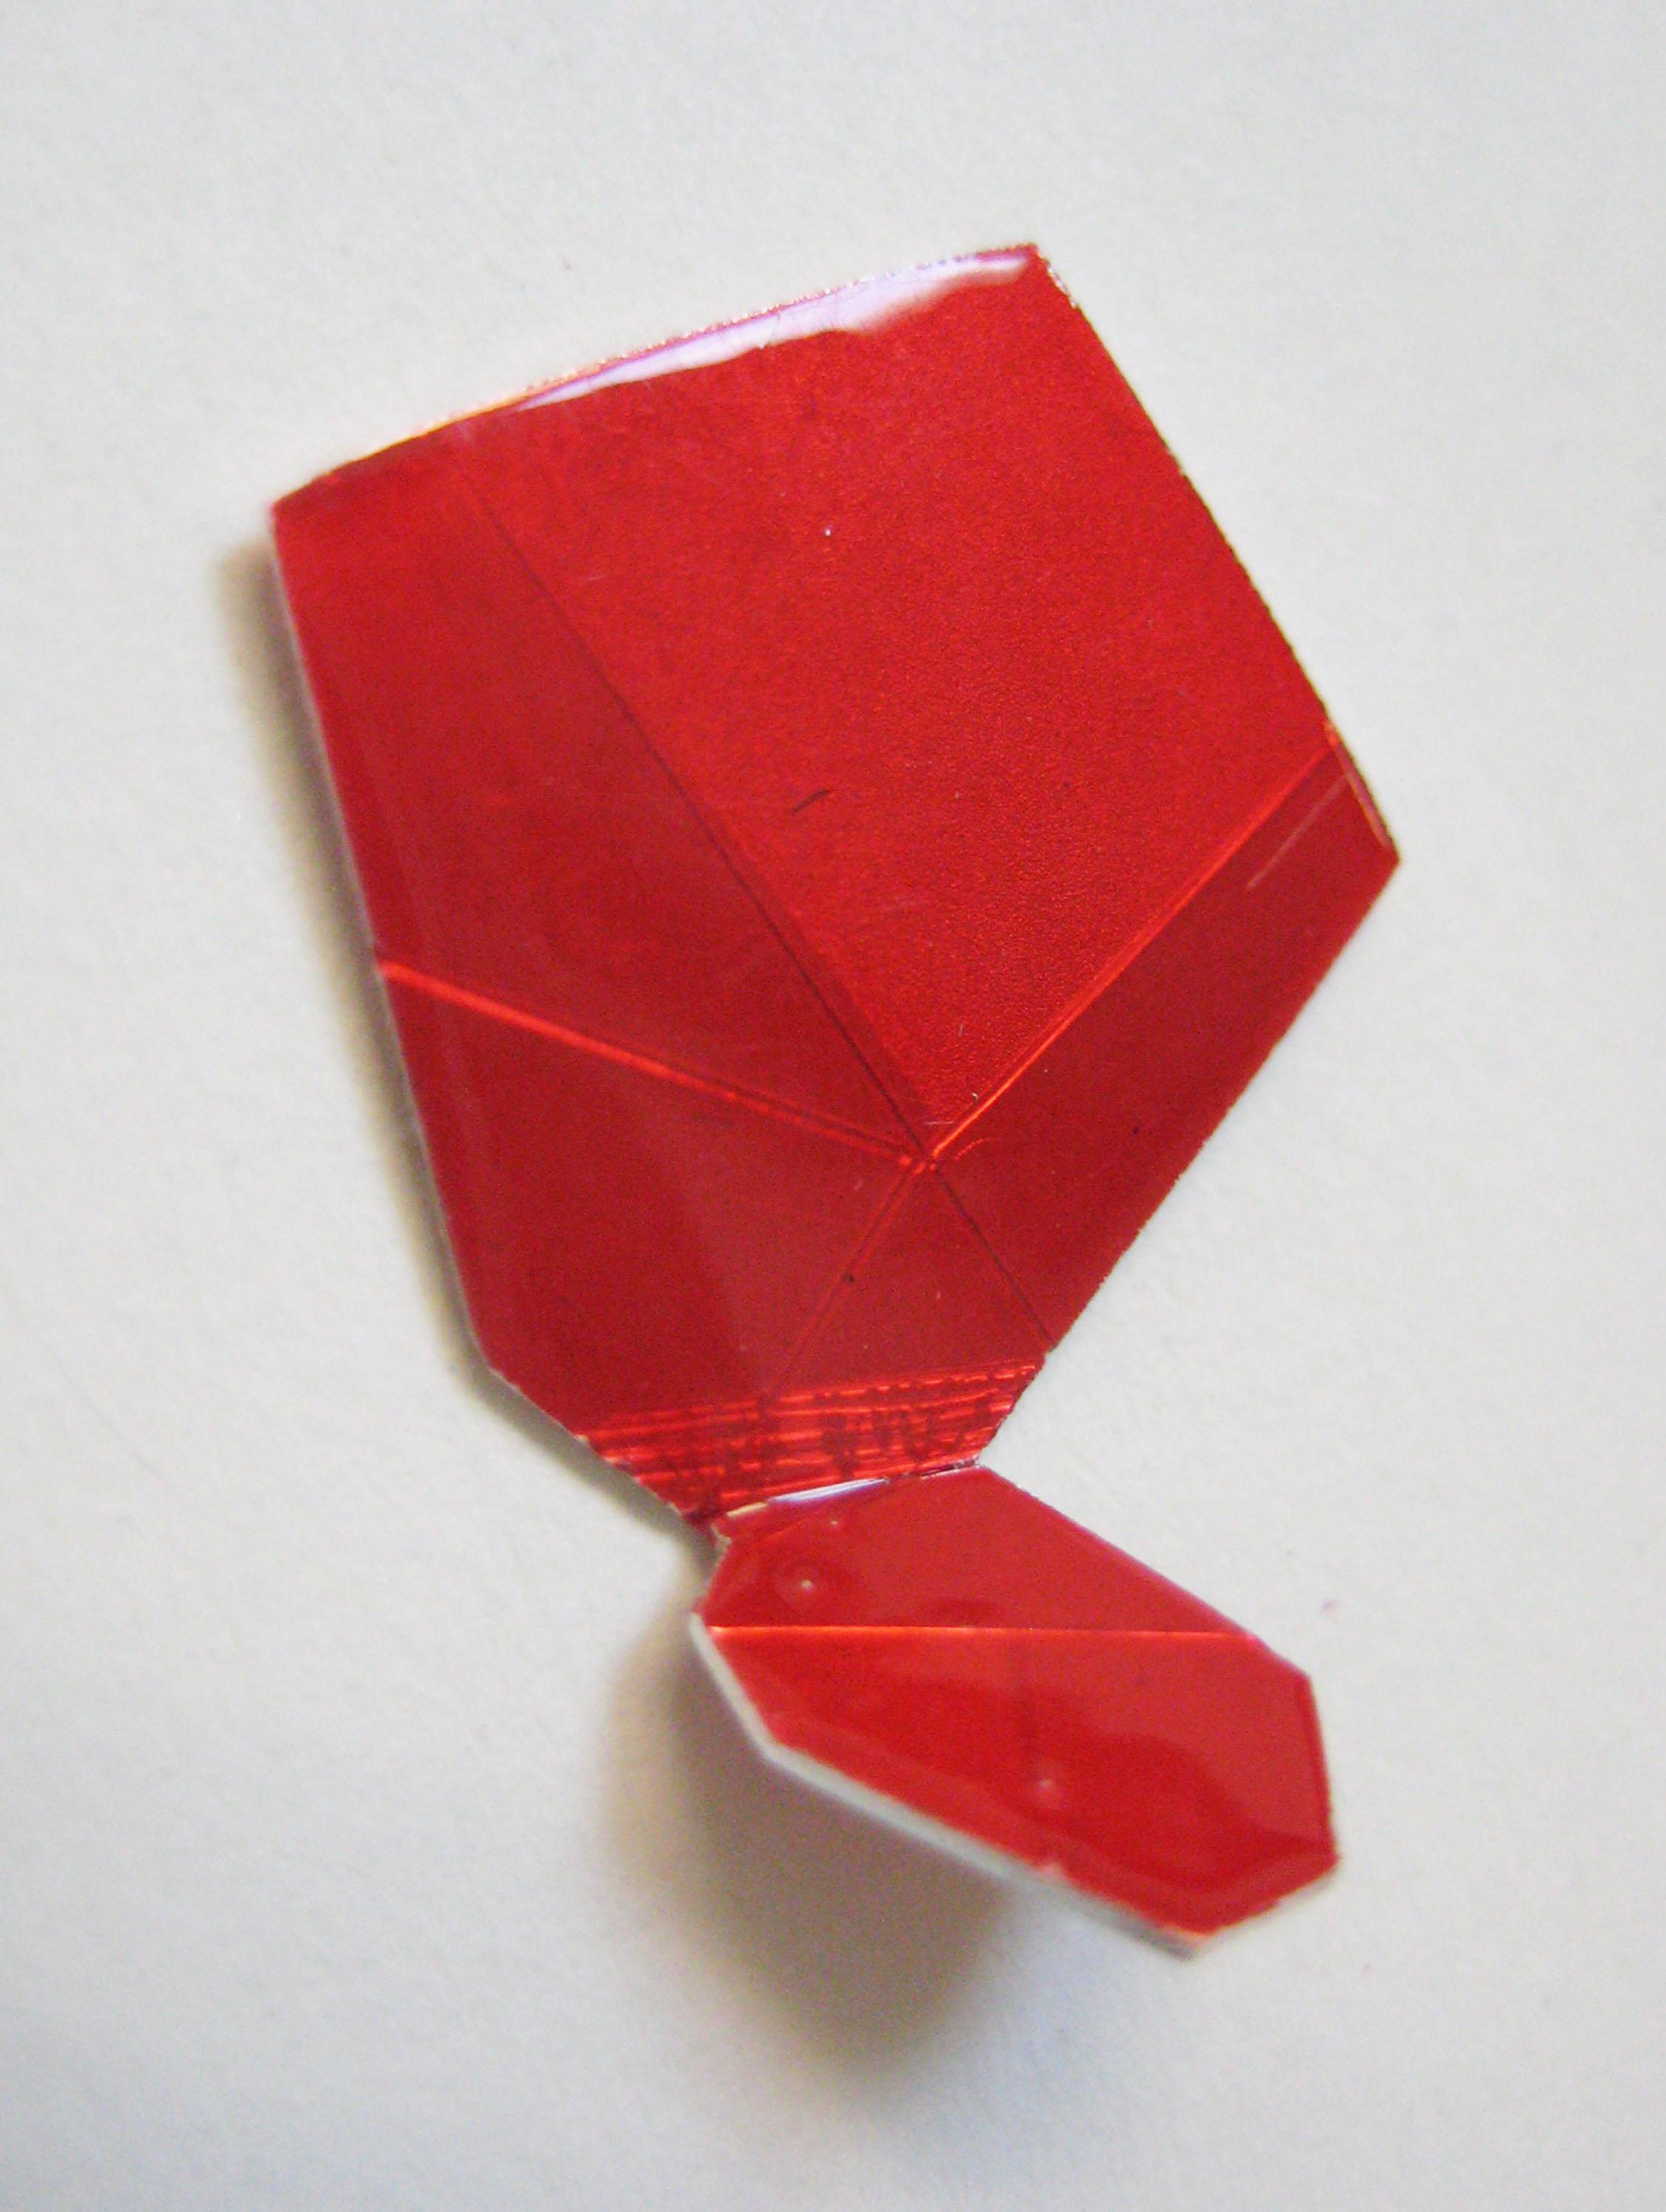 18-Red Pin Gem-Voegele.jpg